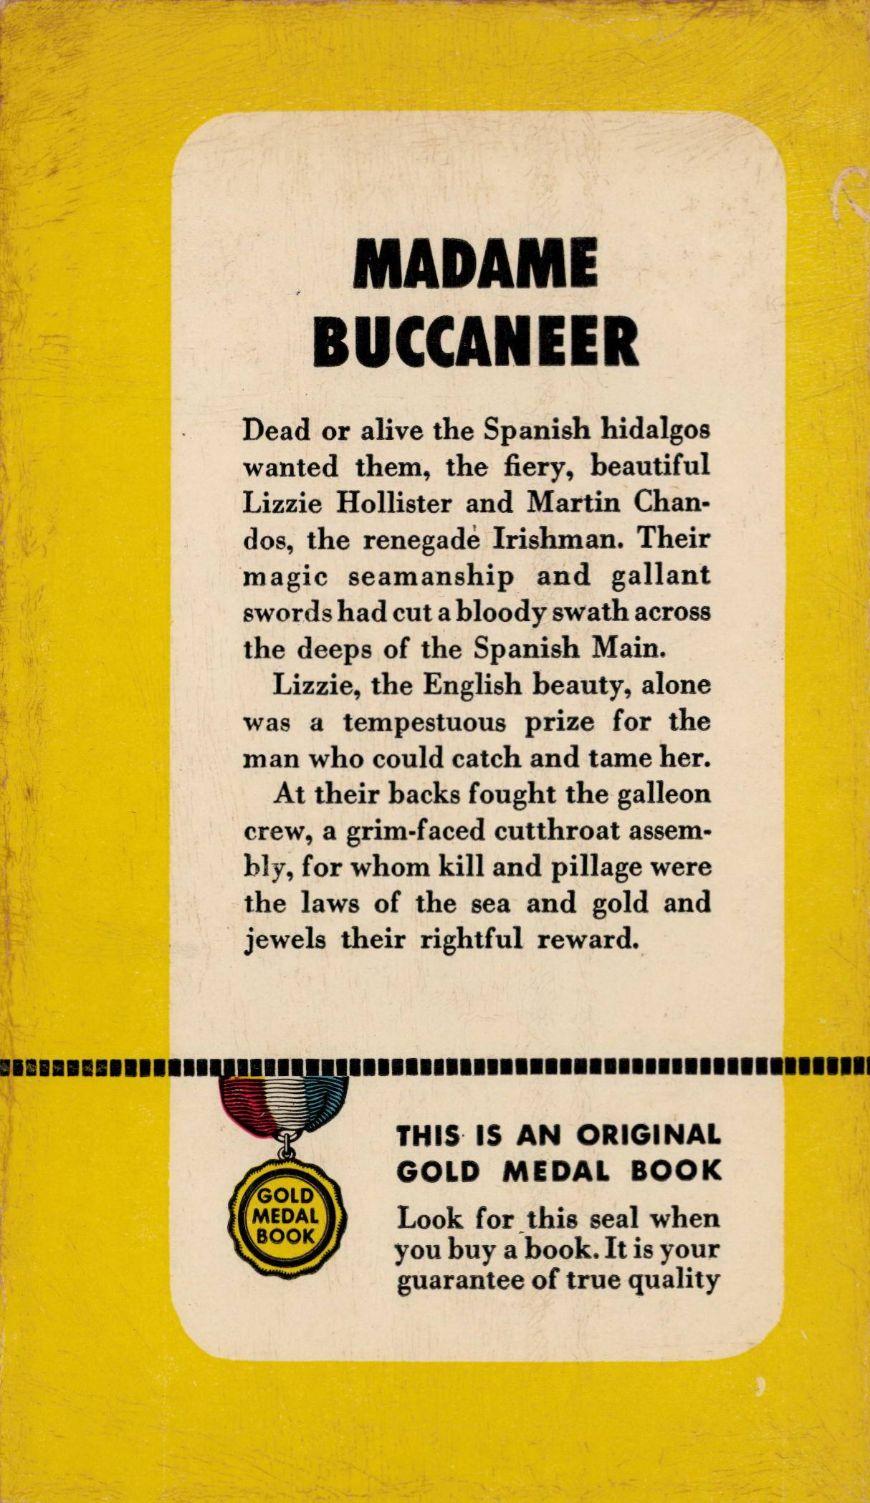 Madame Buccaneer Gardner F Fox 161.jpg